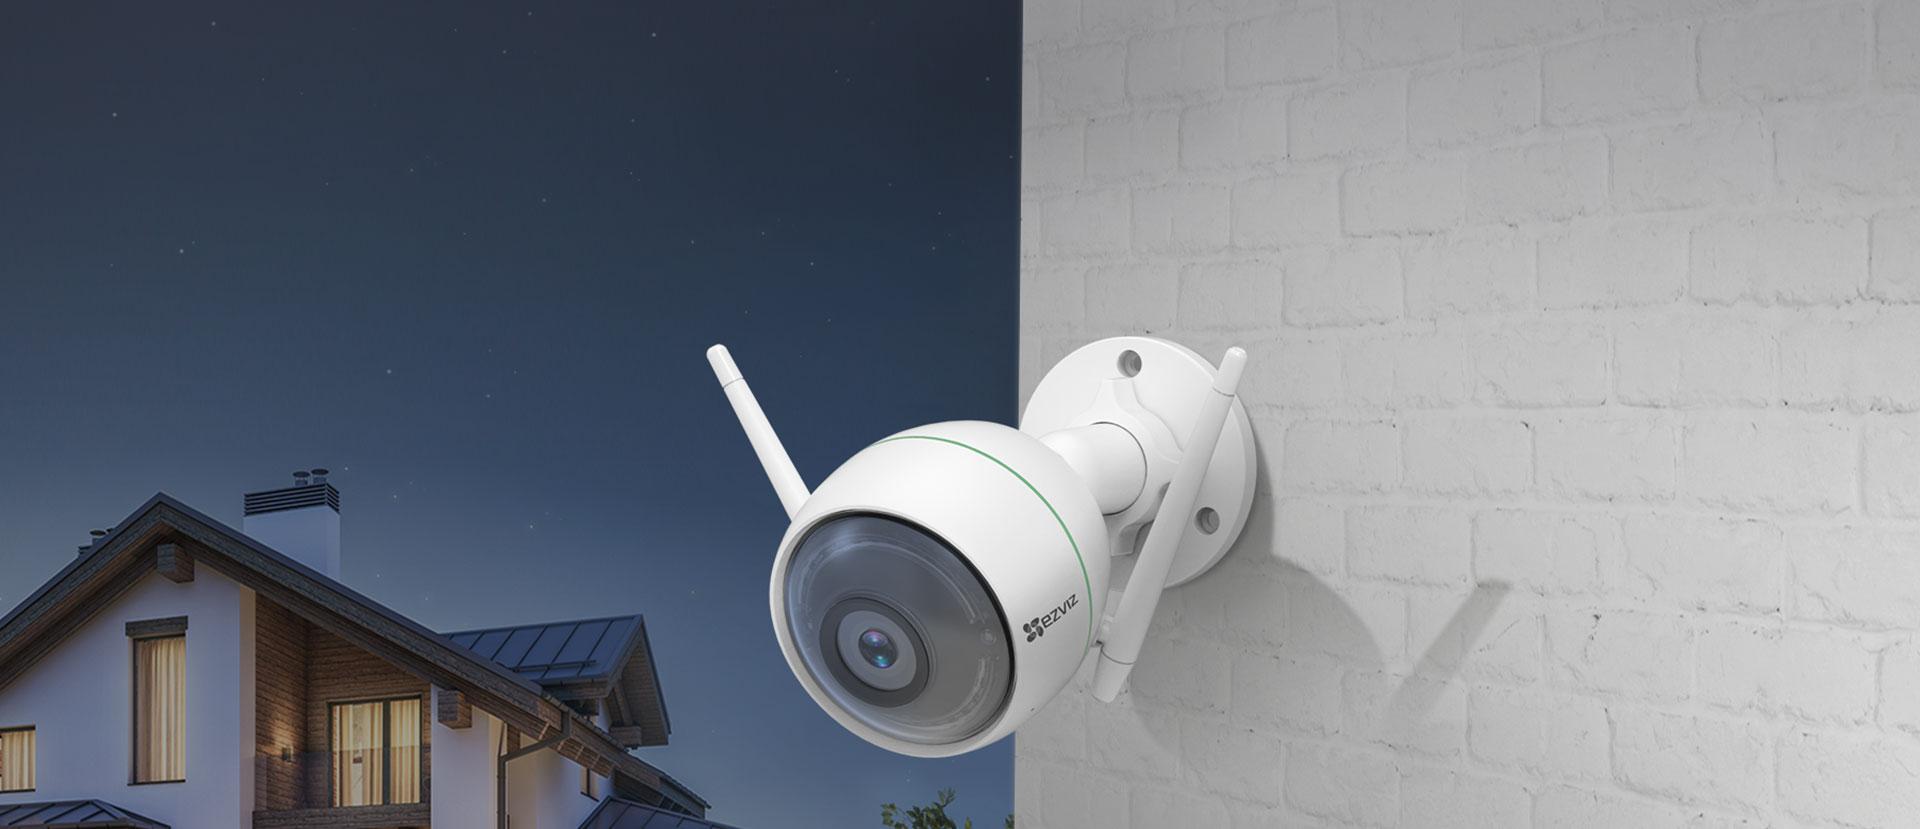 C3WN - EZVIZ Camera Wi-Fi ngoài trời